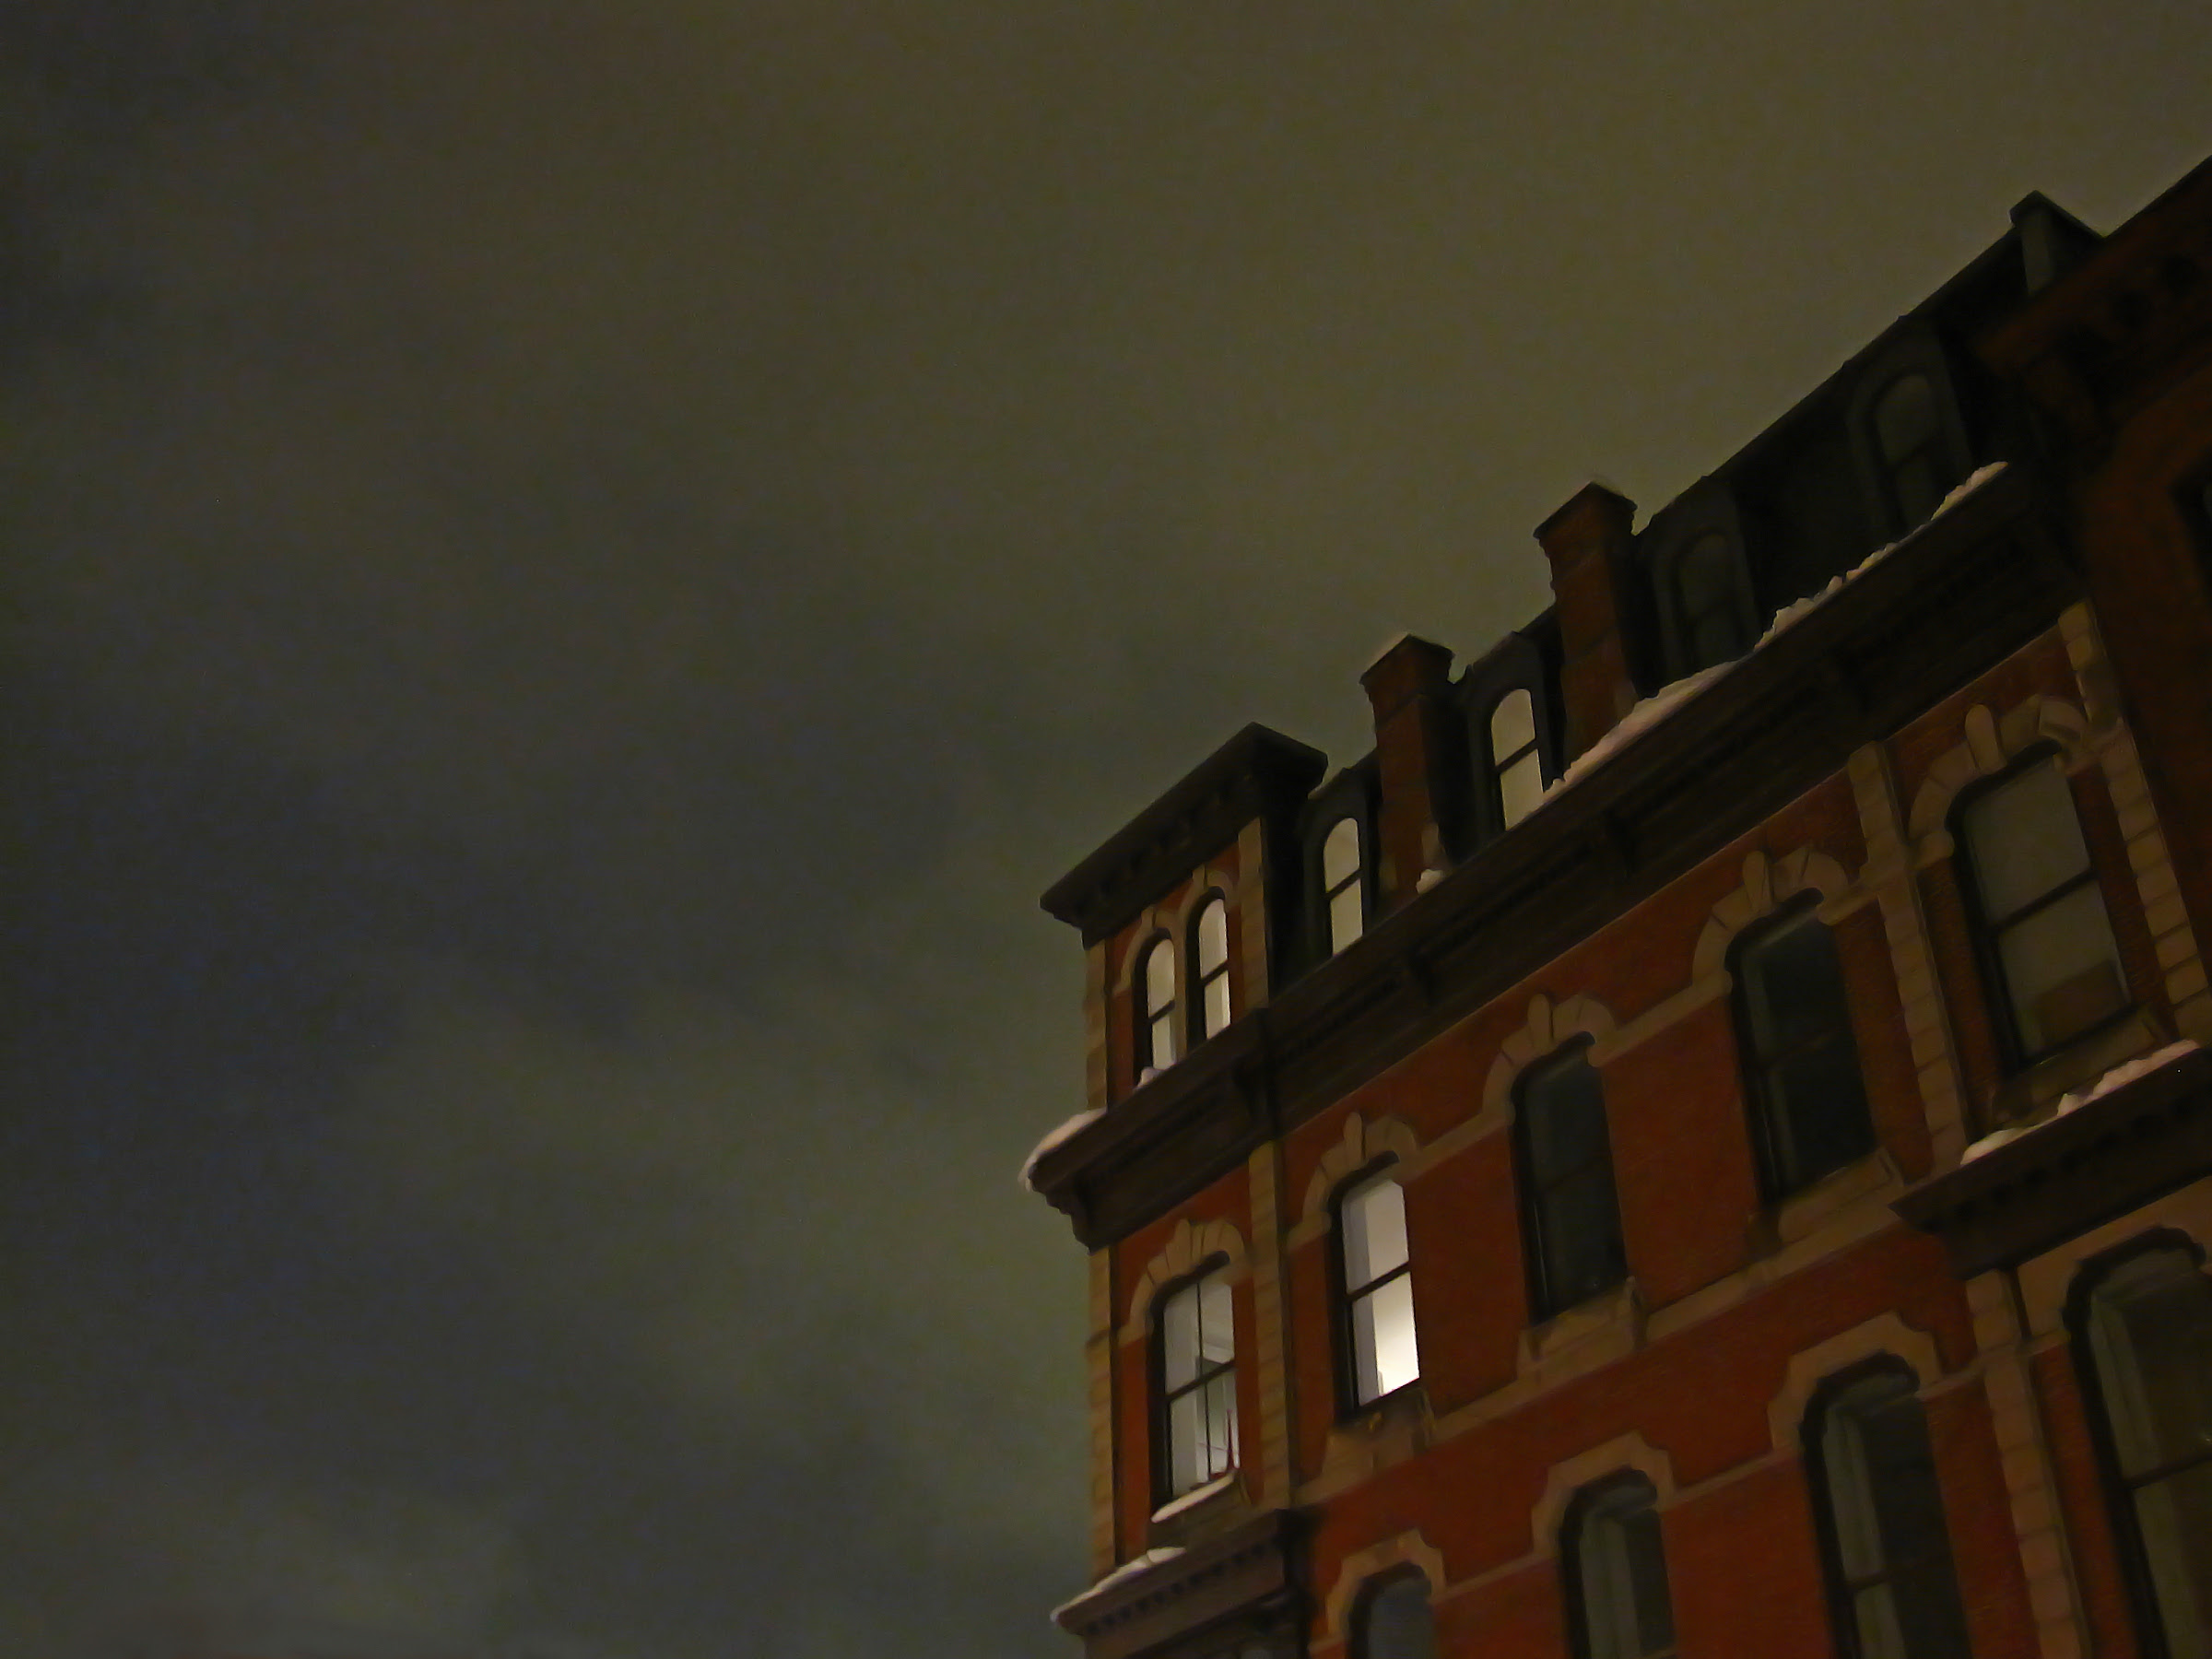 Spooky night on Bowery